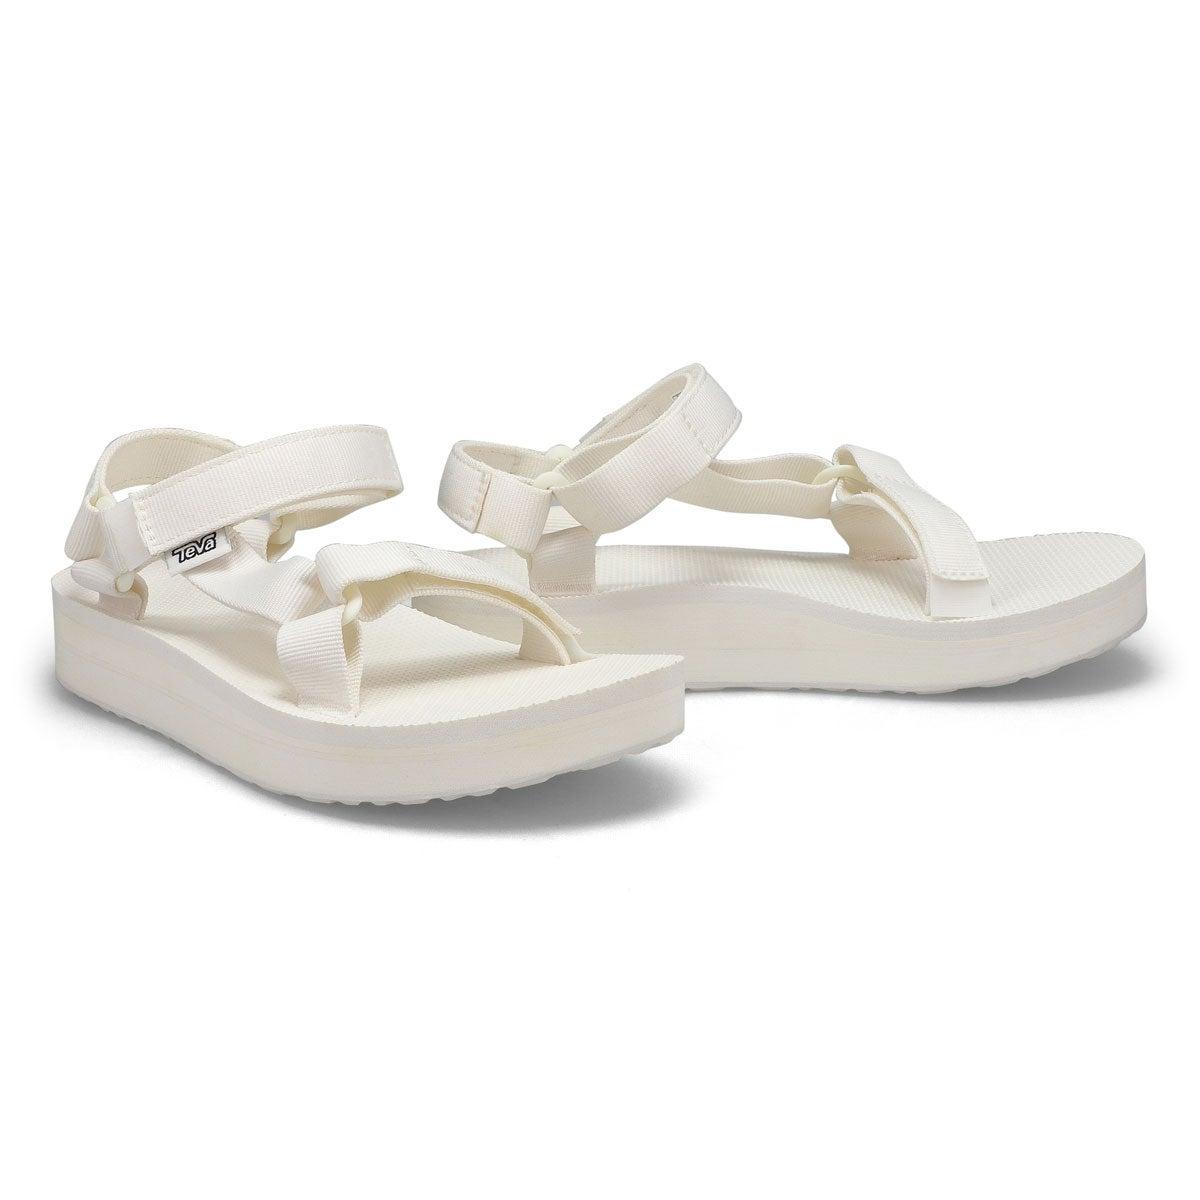 Women's Midform Universal Sport Sandal -Bright Wht